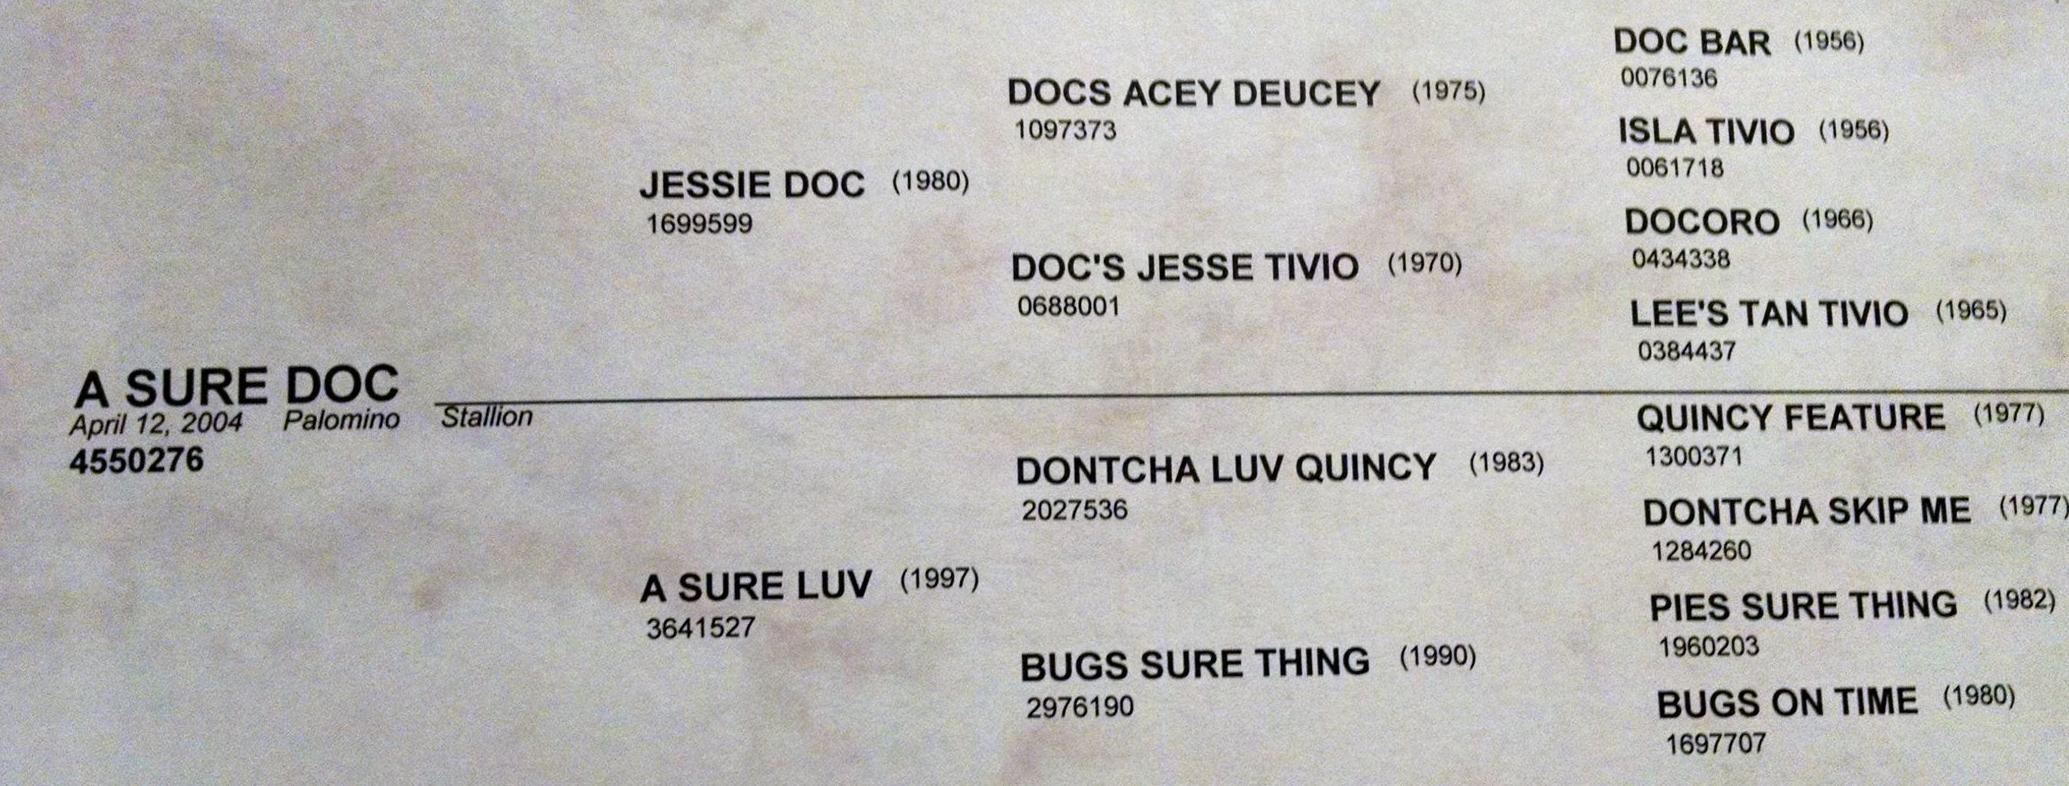 sure doc pedigree.jpg